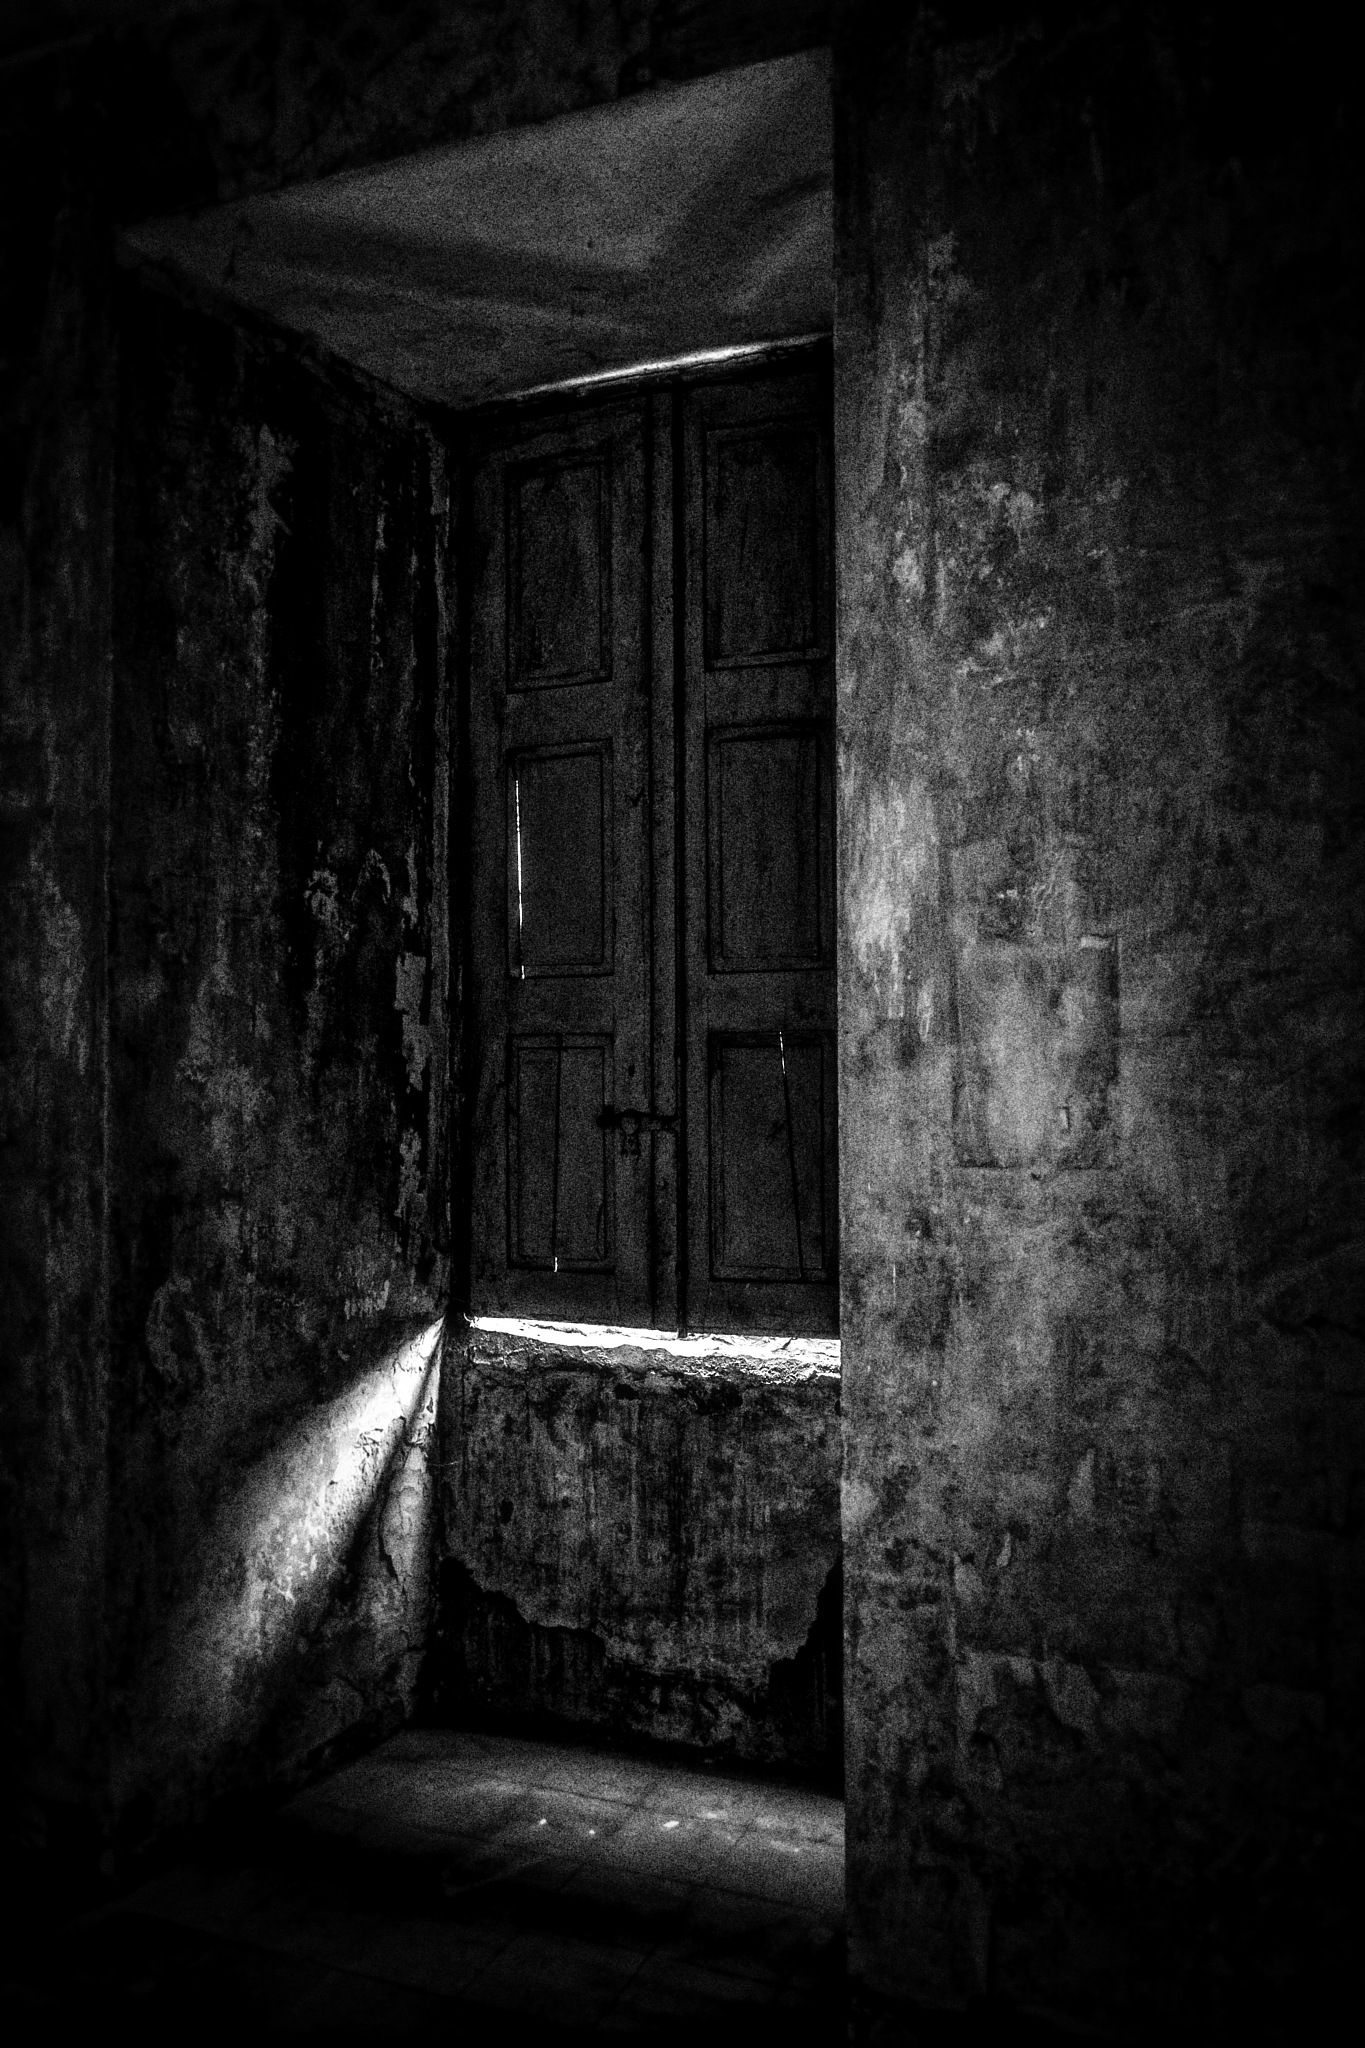 Glimmers by FrancescoPala